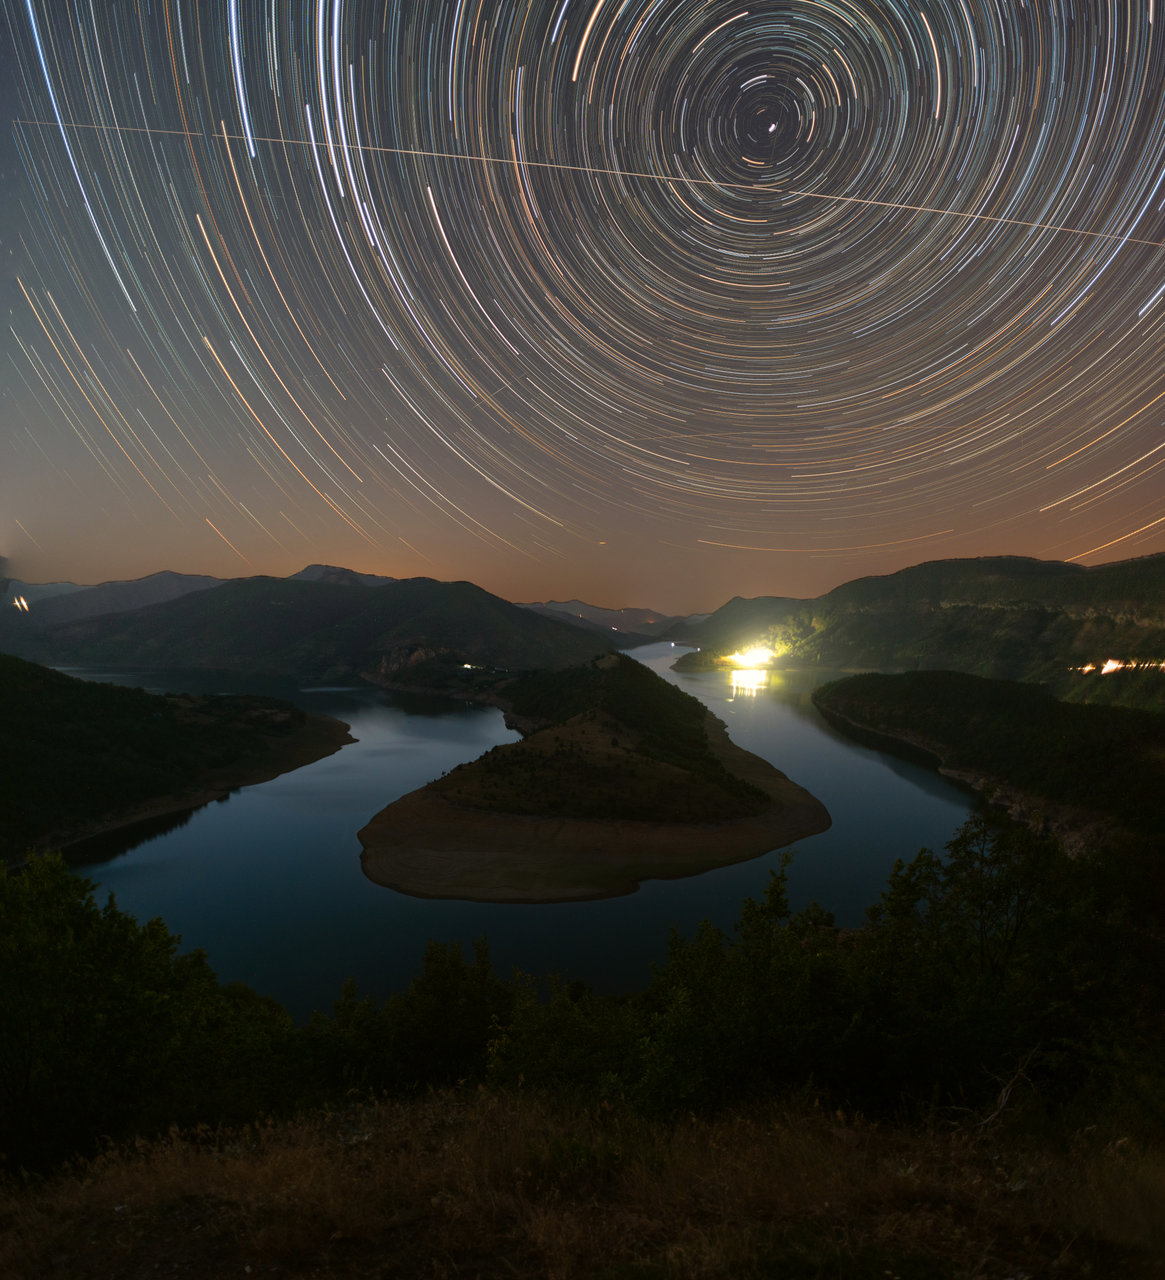 Photo in Panorama | Author Vangel Tonev - Tonev88 | PHOTO FORUM